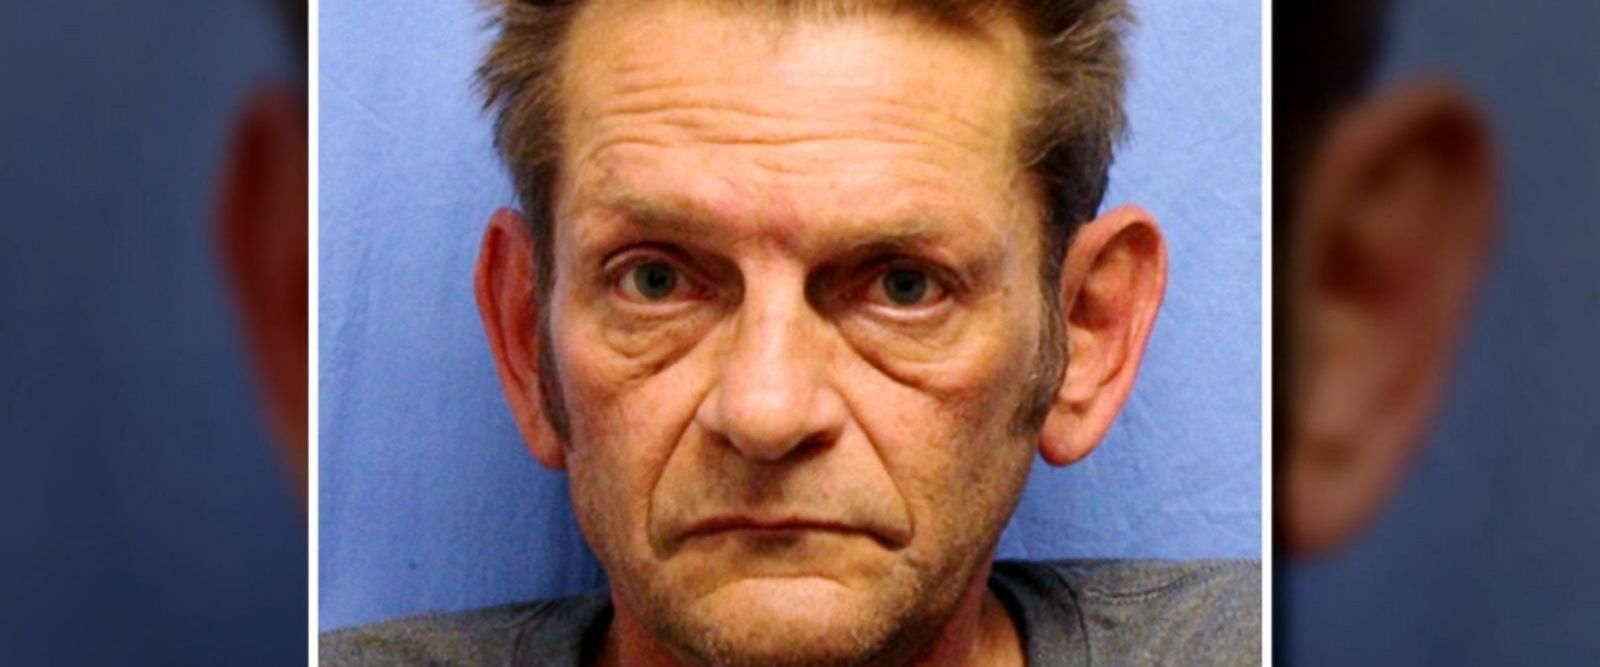 VIDEO: FBI investigates Kansas City triple shooting as hate crime